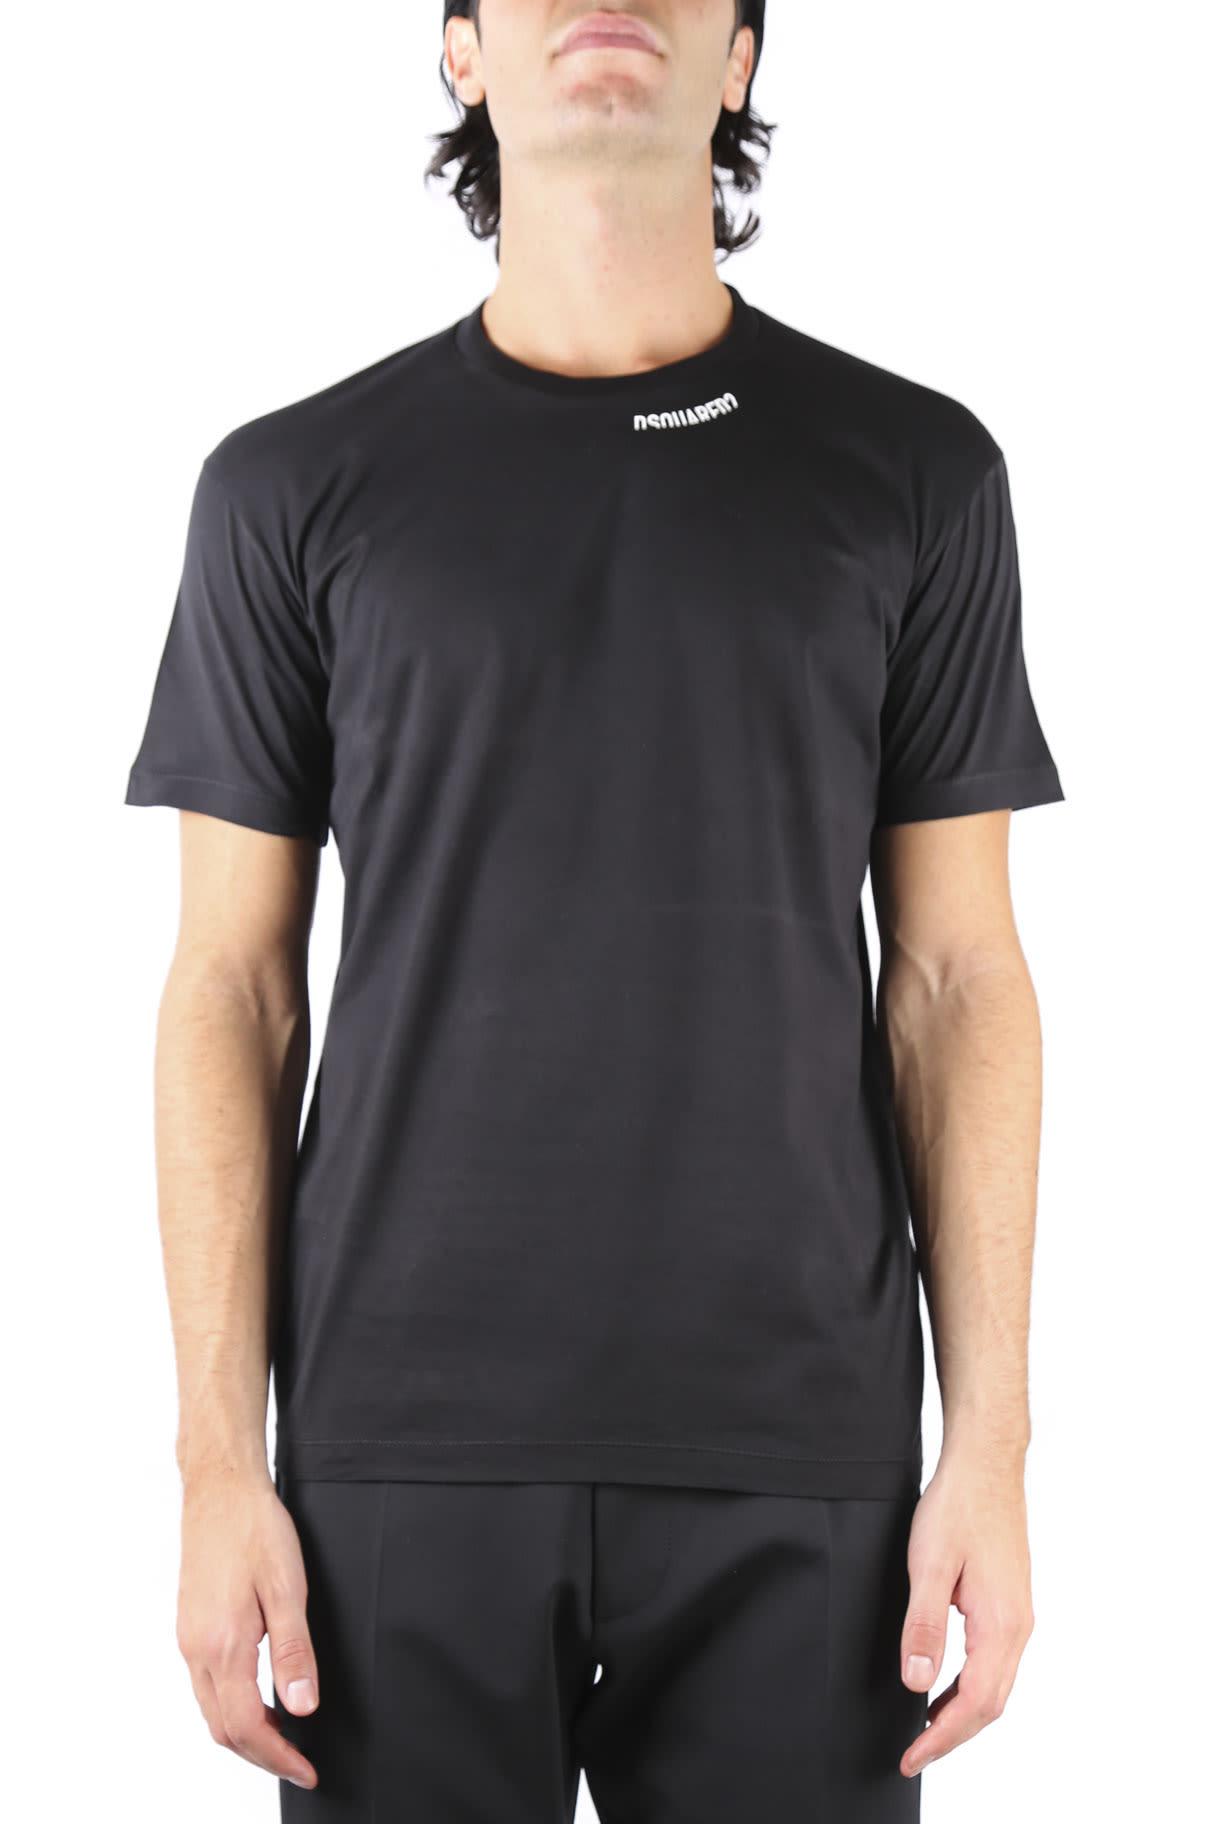 Dsquared2 Black Dsq2 Cotton T-shirt